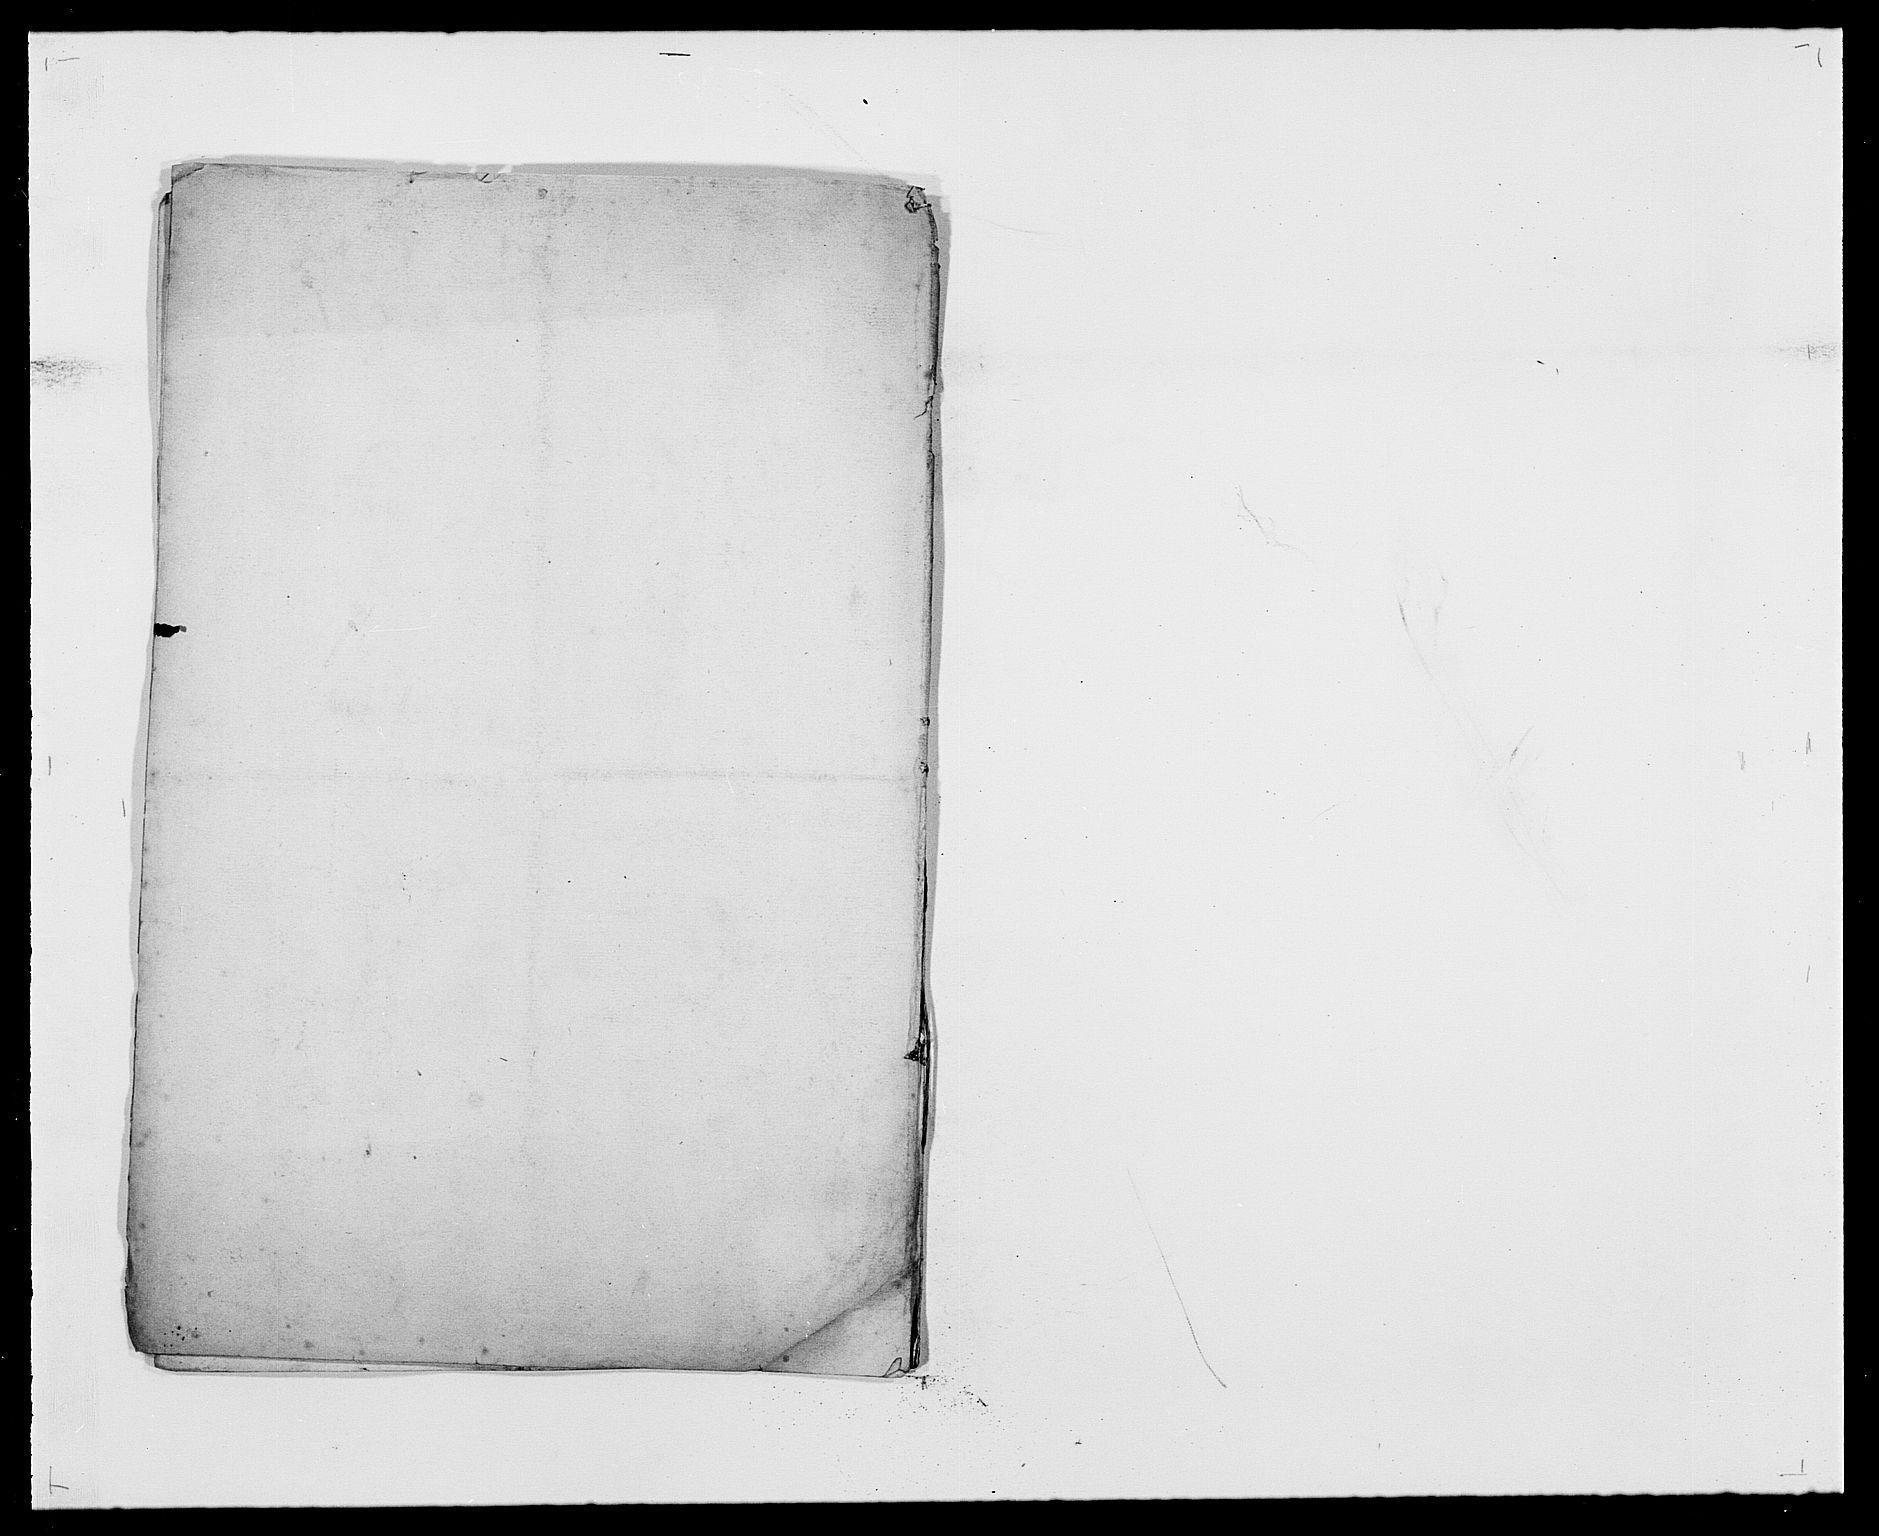 RA, Rentekammeret inntil 1814, Reviderte regnskaper, Fogderegnskap, R25/L1675: Fogderegnskap Buskerud, 1678-1681, s. 429